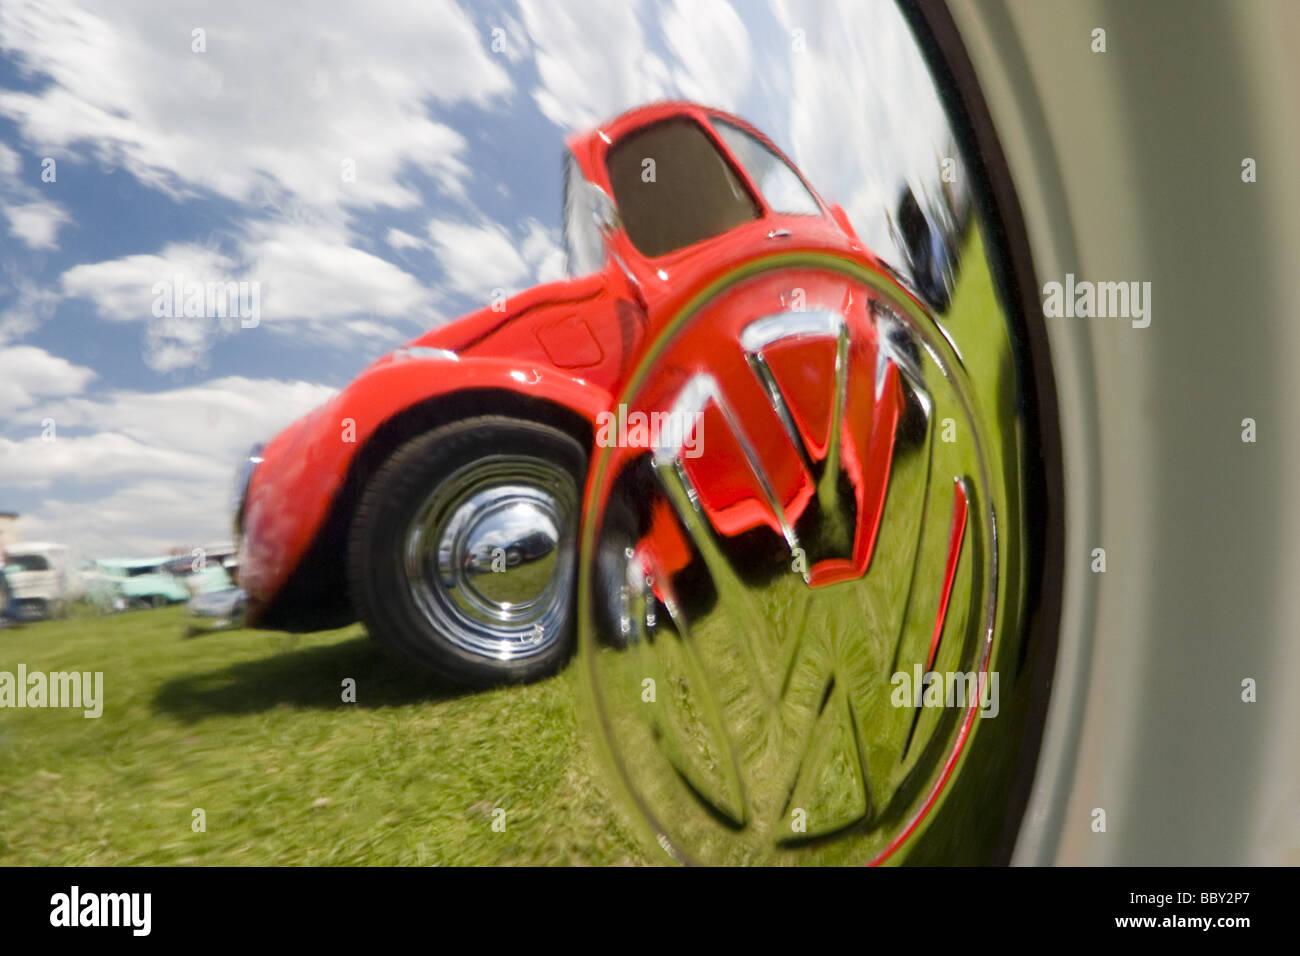 Orange Volkswagen Beetle reflected in chrome VW hub cap - Stock Image